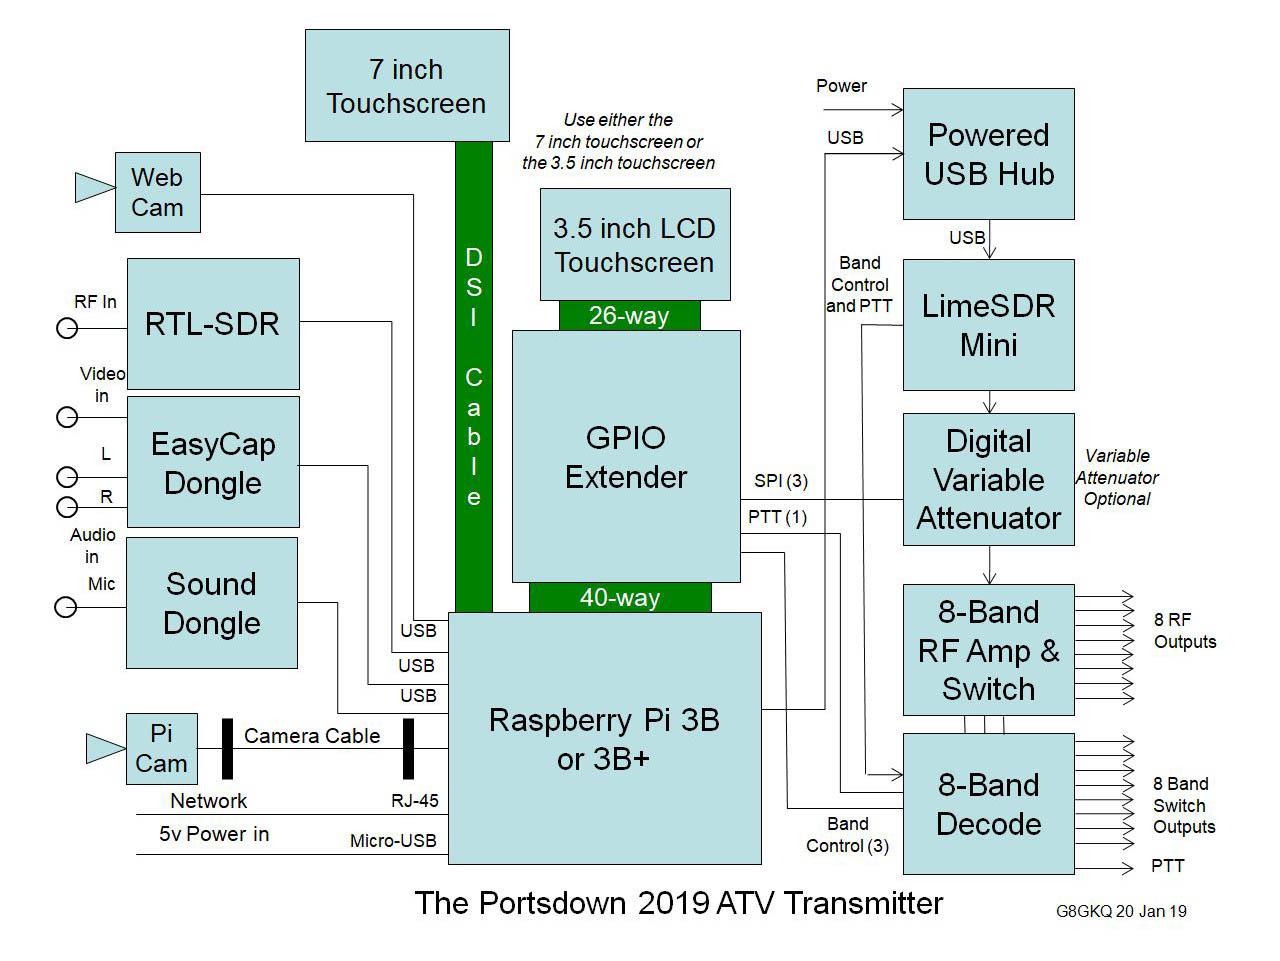 BATC Portsdown Block Diagram